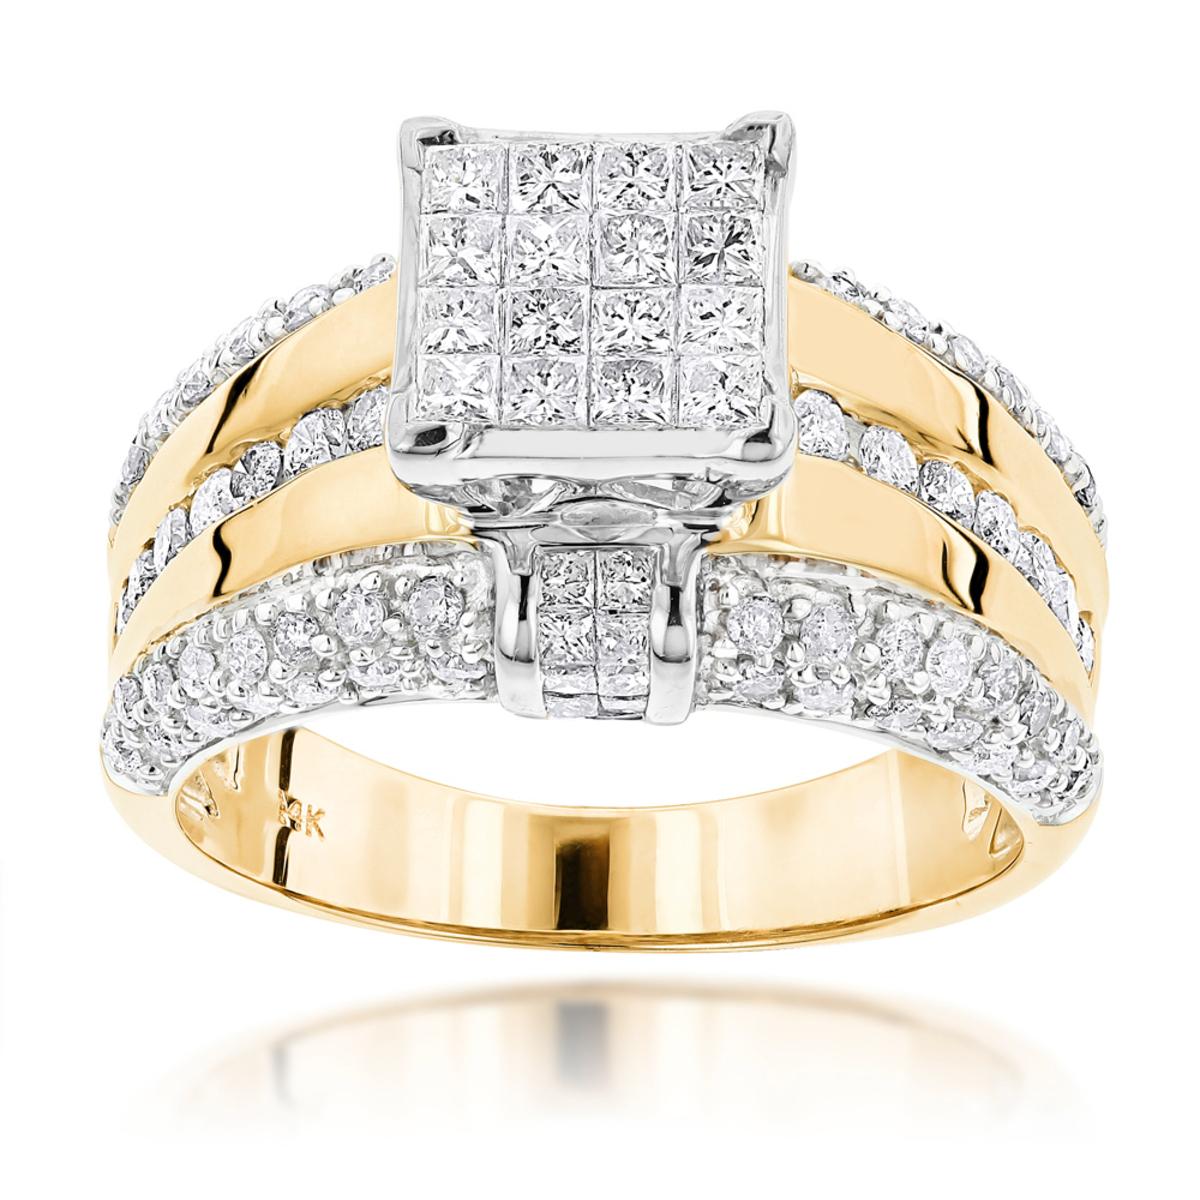 14K Gold Designer Diamond Engagement Ring 1.88ct